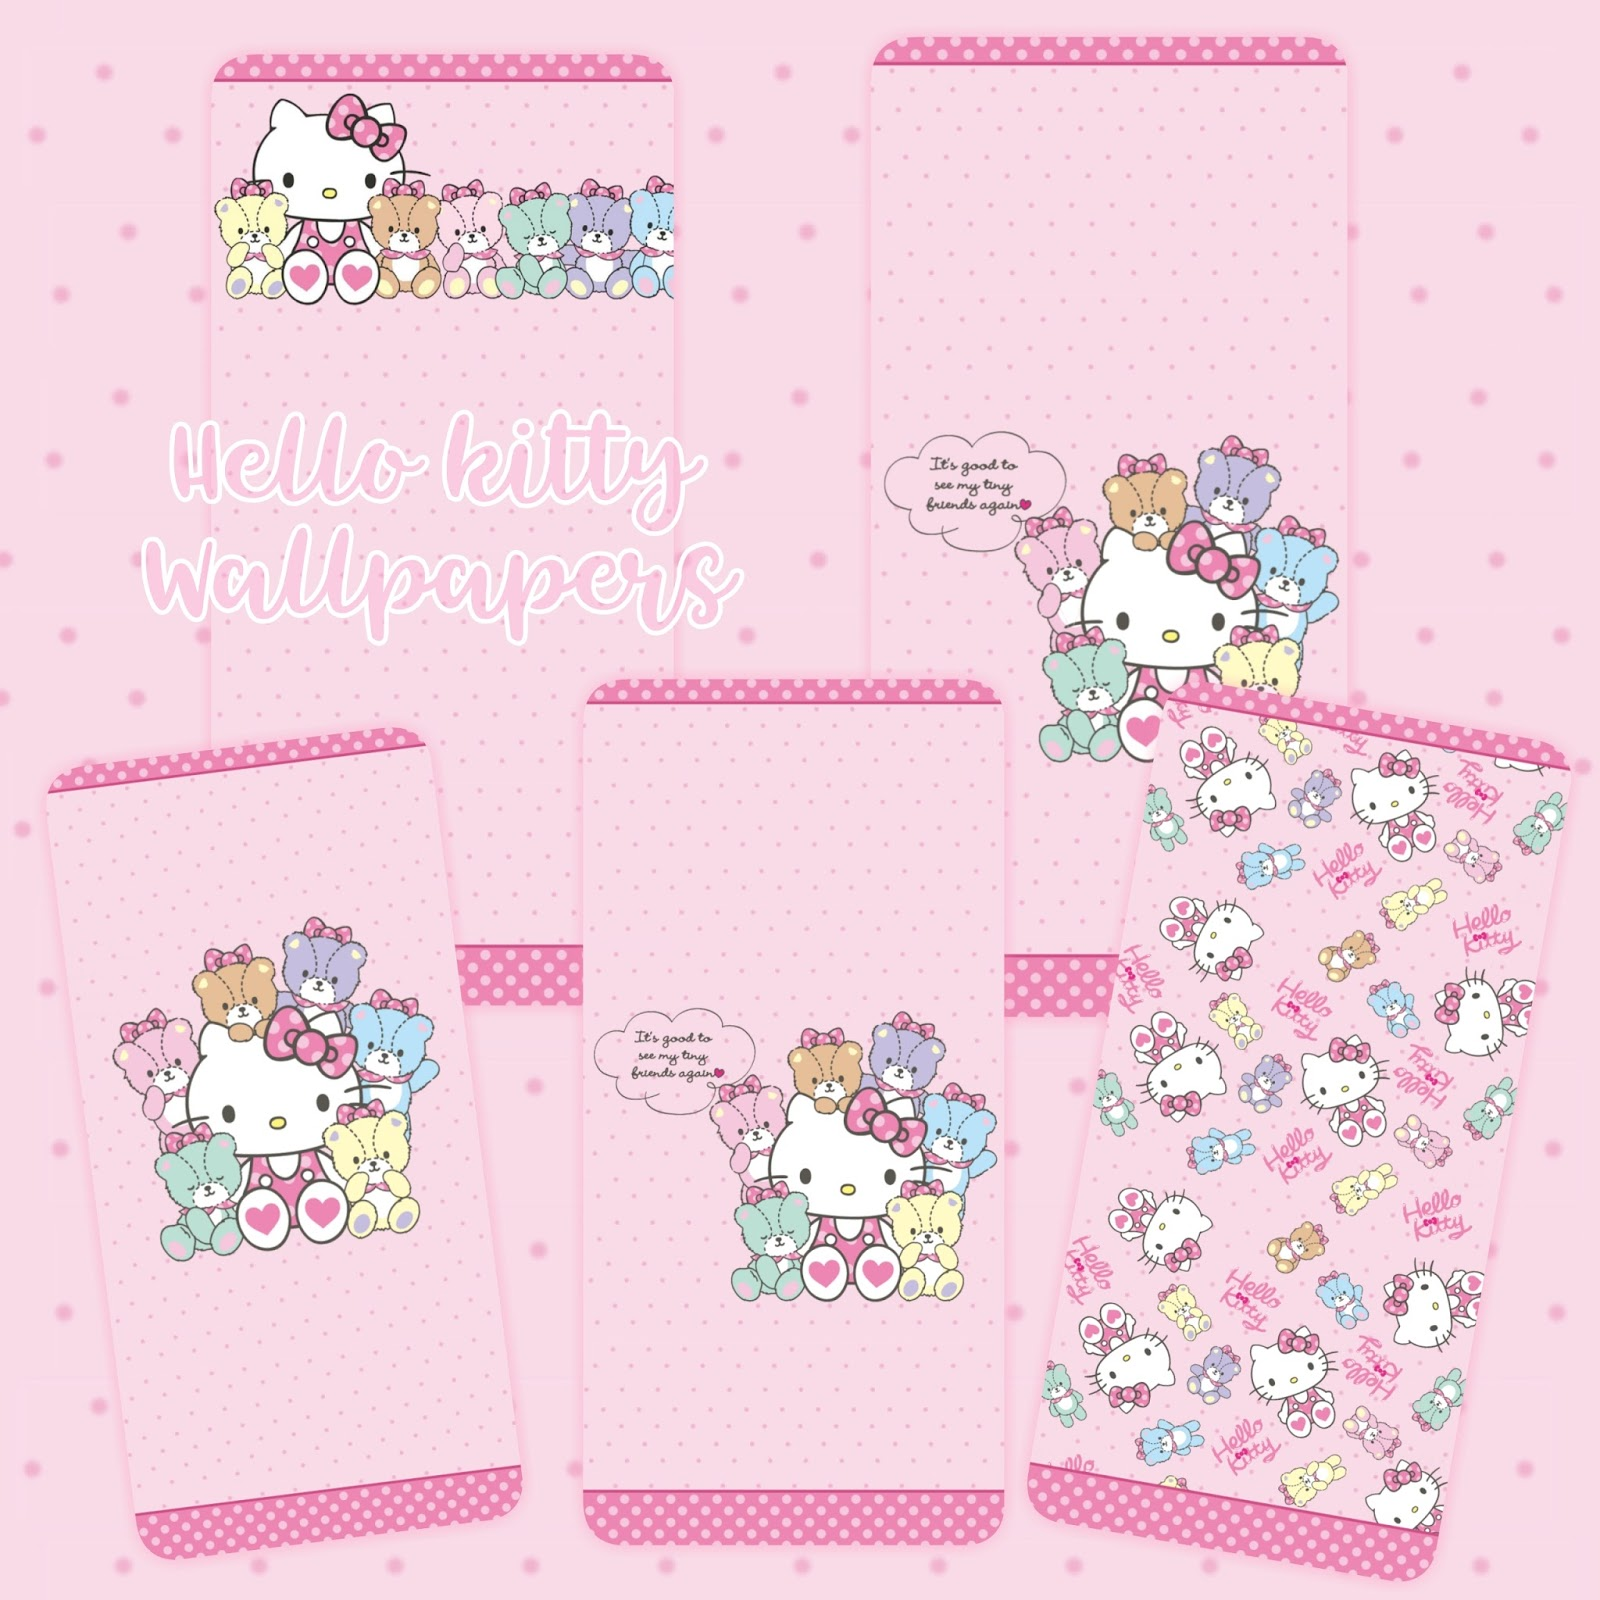 Great Wallpaper Hello Kitty Bear - 18-02-07-06-59-49-686_deco  Pic_93754.jpg